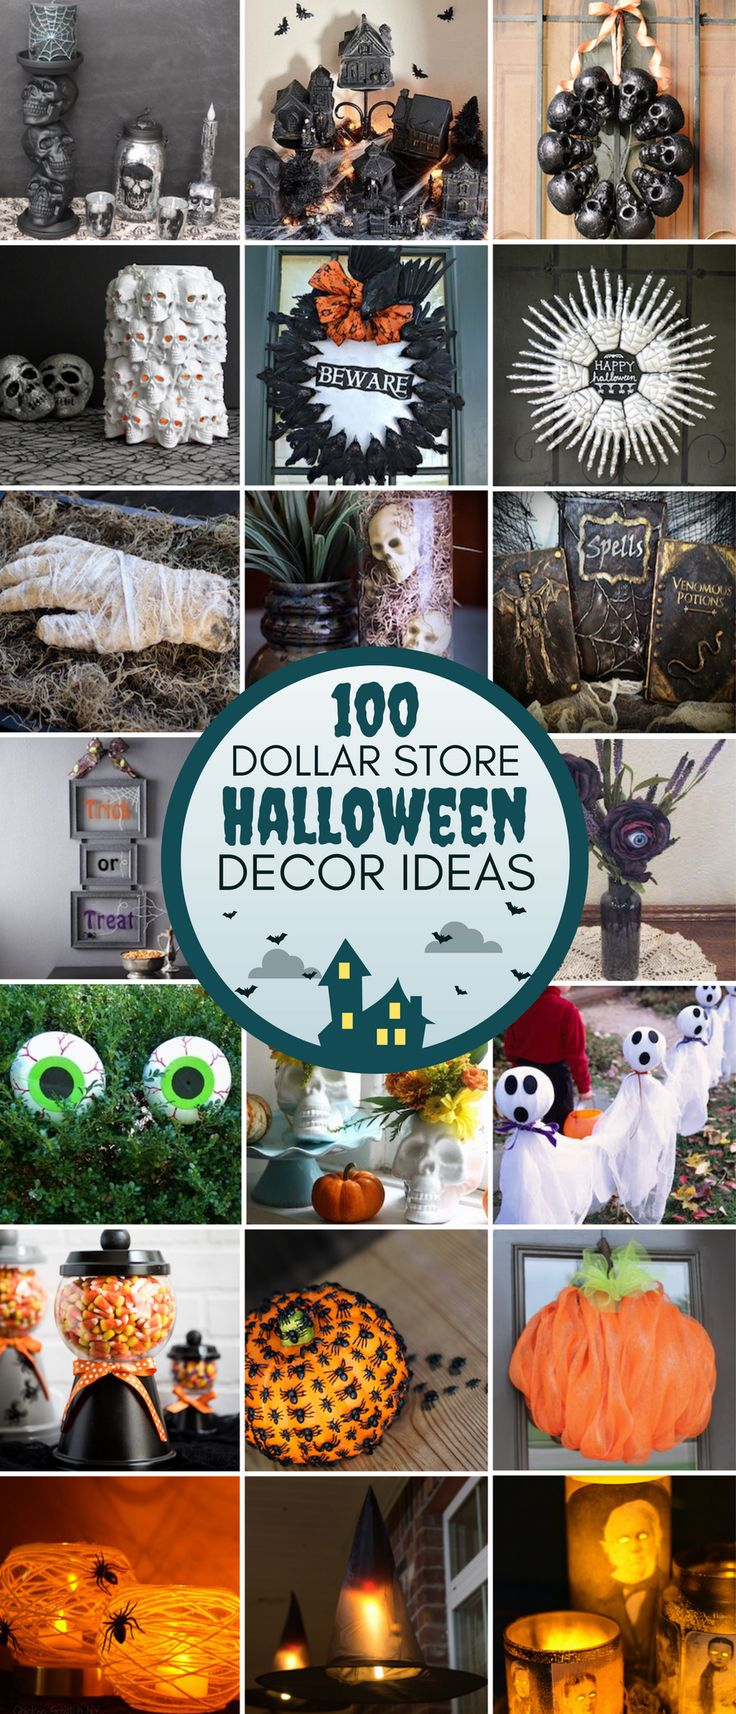 100 Dollar Store Halloween Decor DIY Ideas